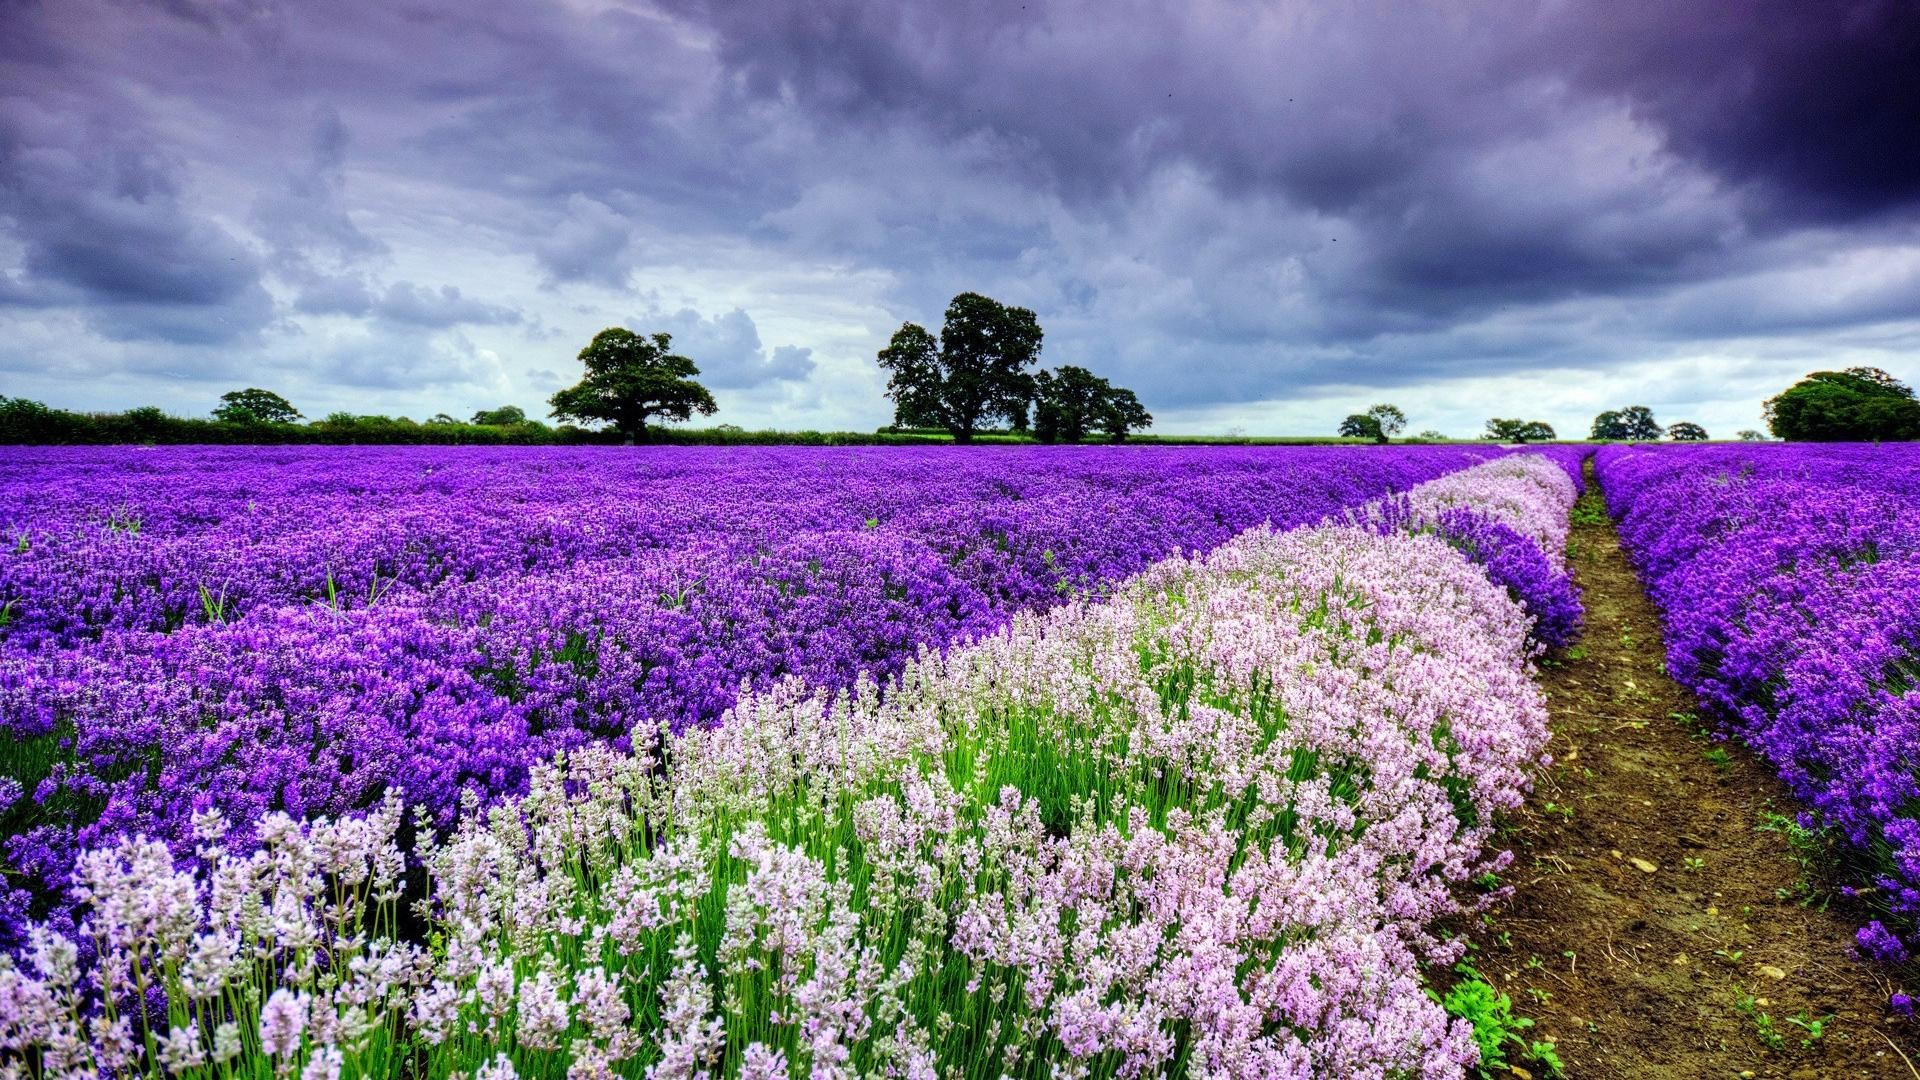 Beautiful Field of Flowers Spring Image.